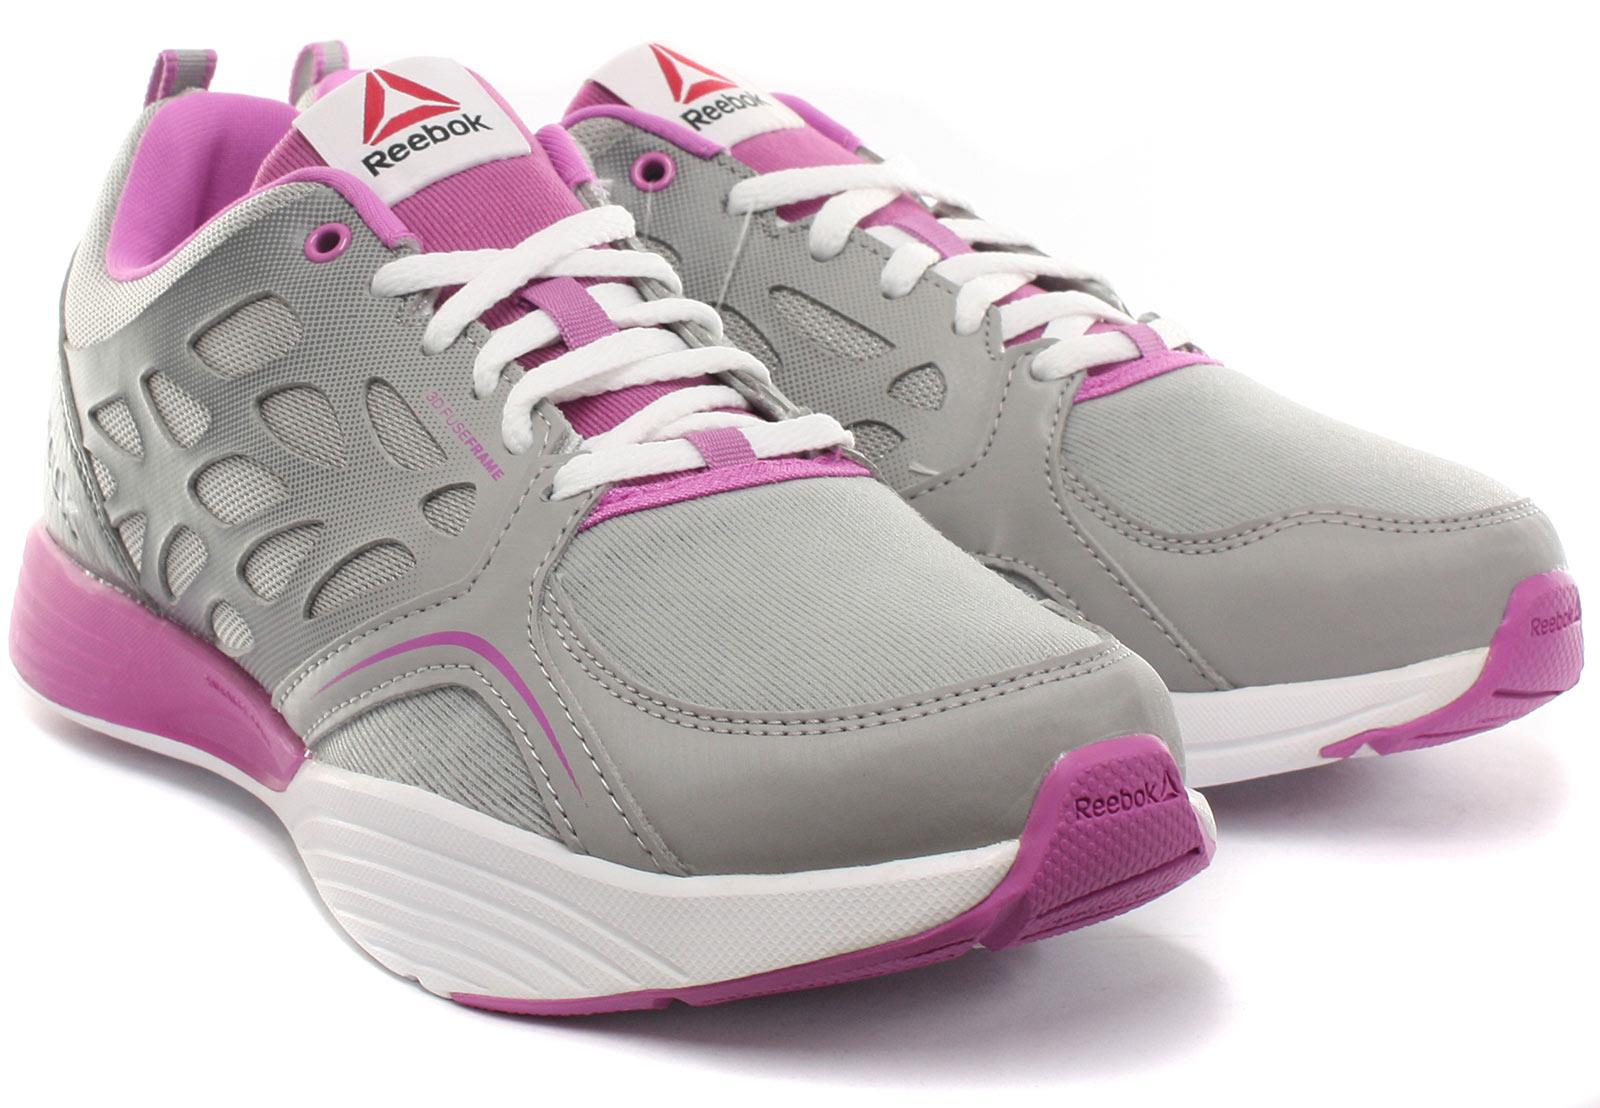 a974597fdb3 Reebok Cardio Inspire Low Womens Studio Fitness Trainers ALL SIZES ...